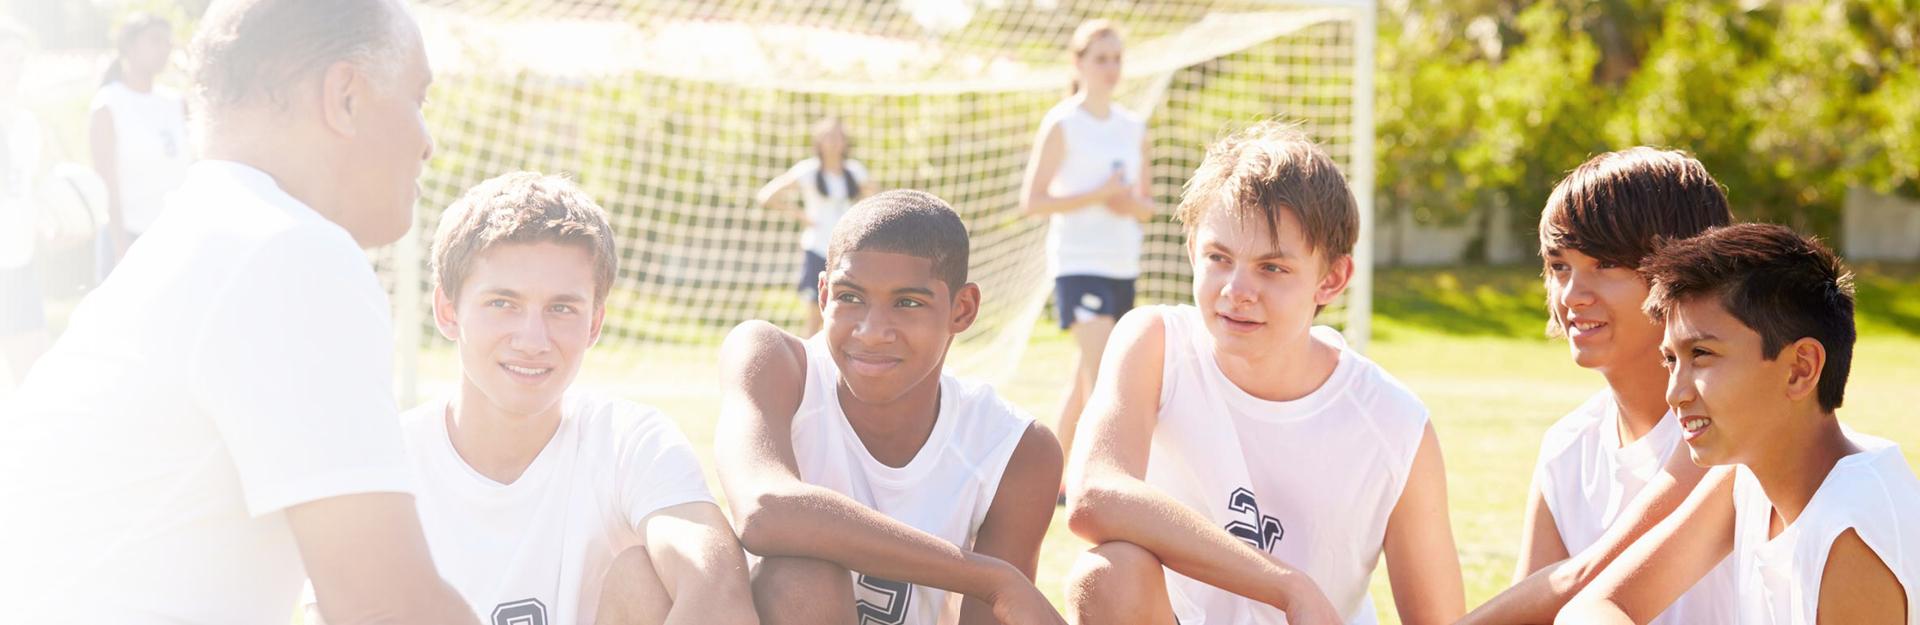 Website Banner Sports Physicals